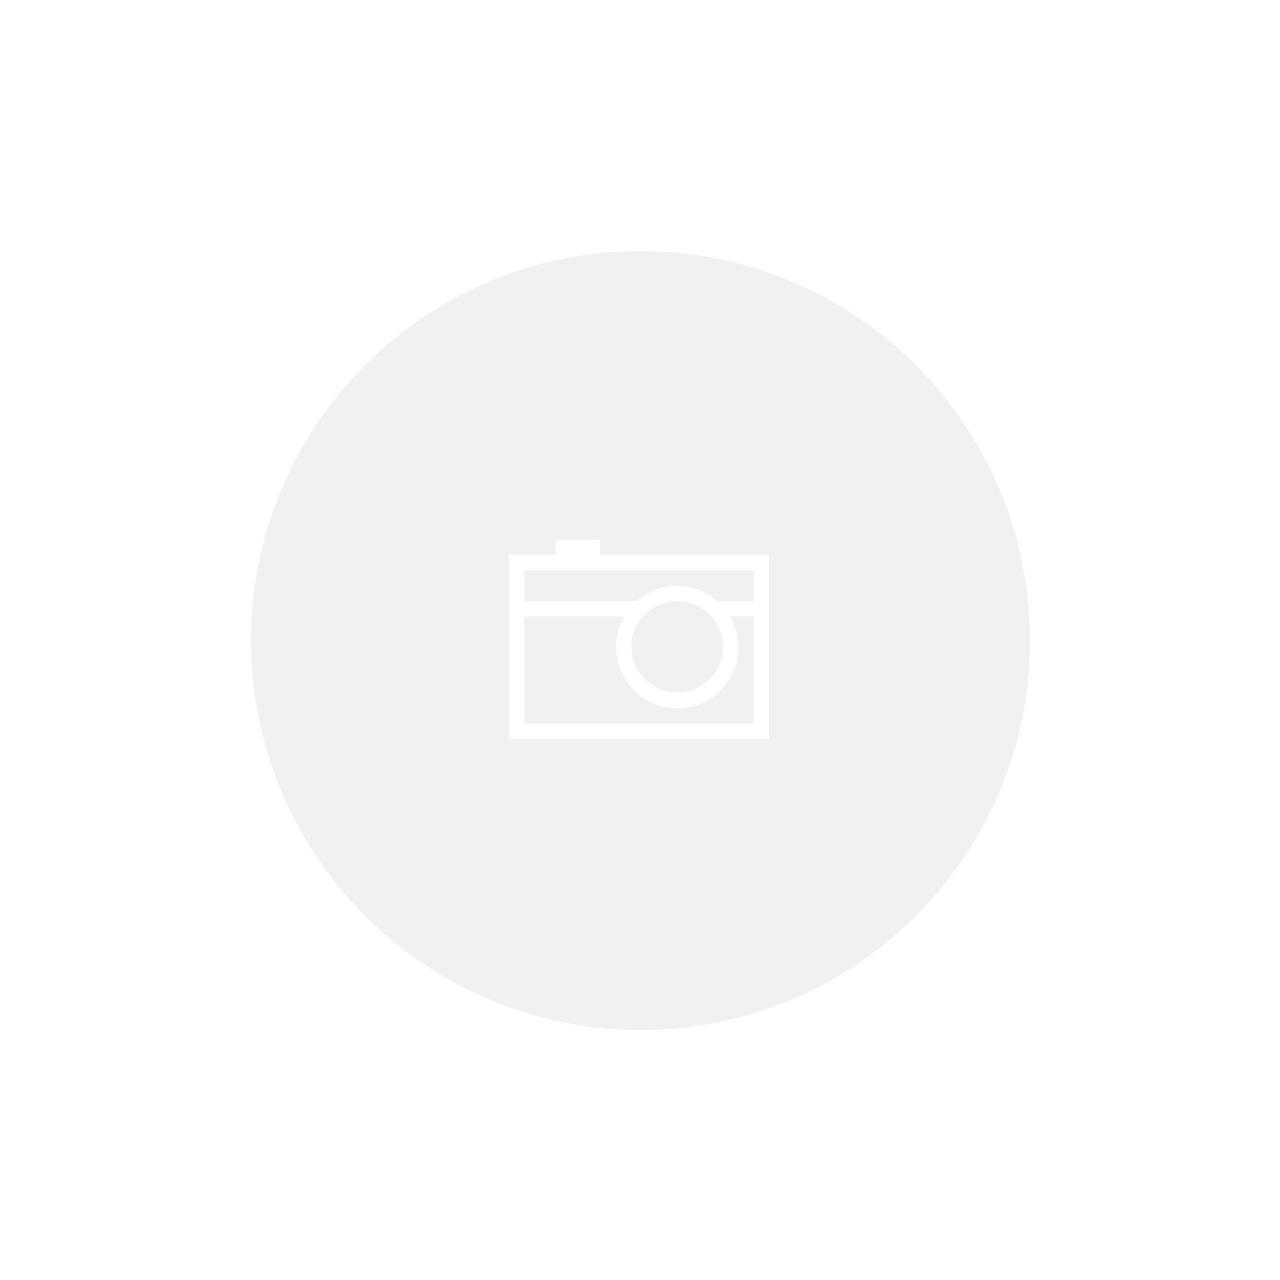 Coifa de Parede New Dritta 90 220v Tramontina